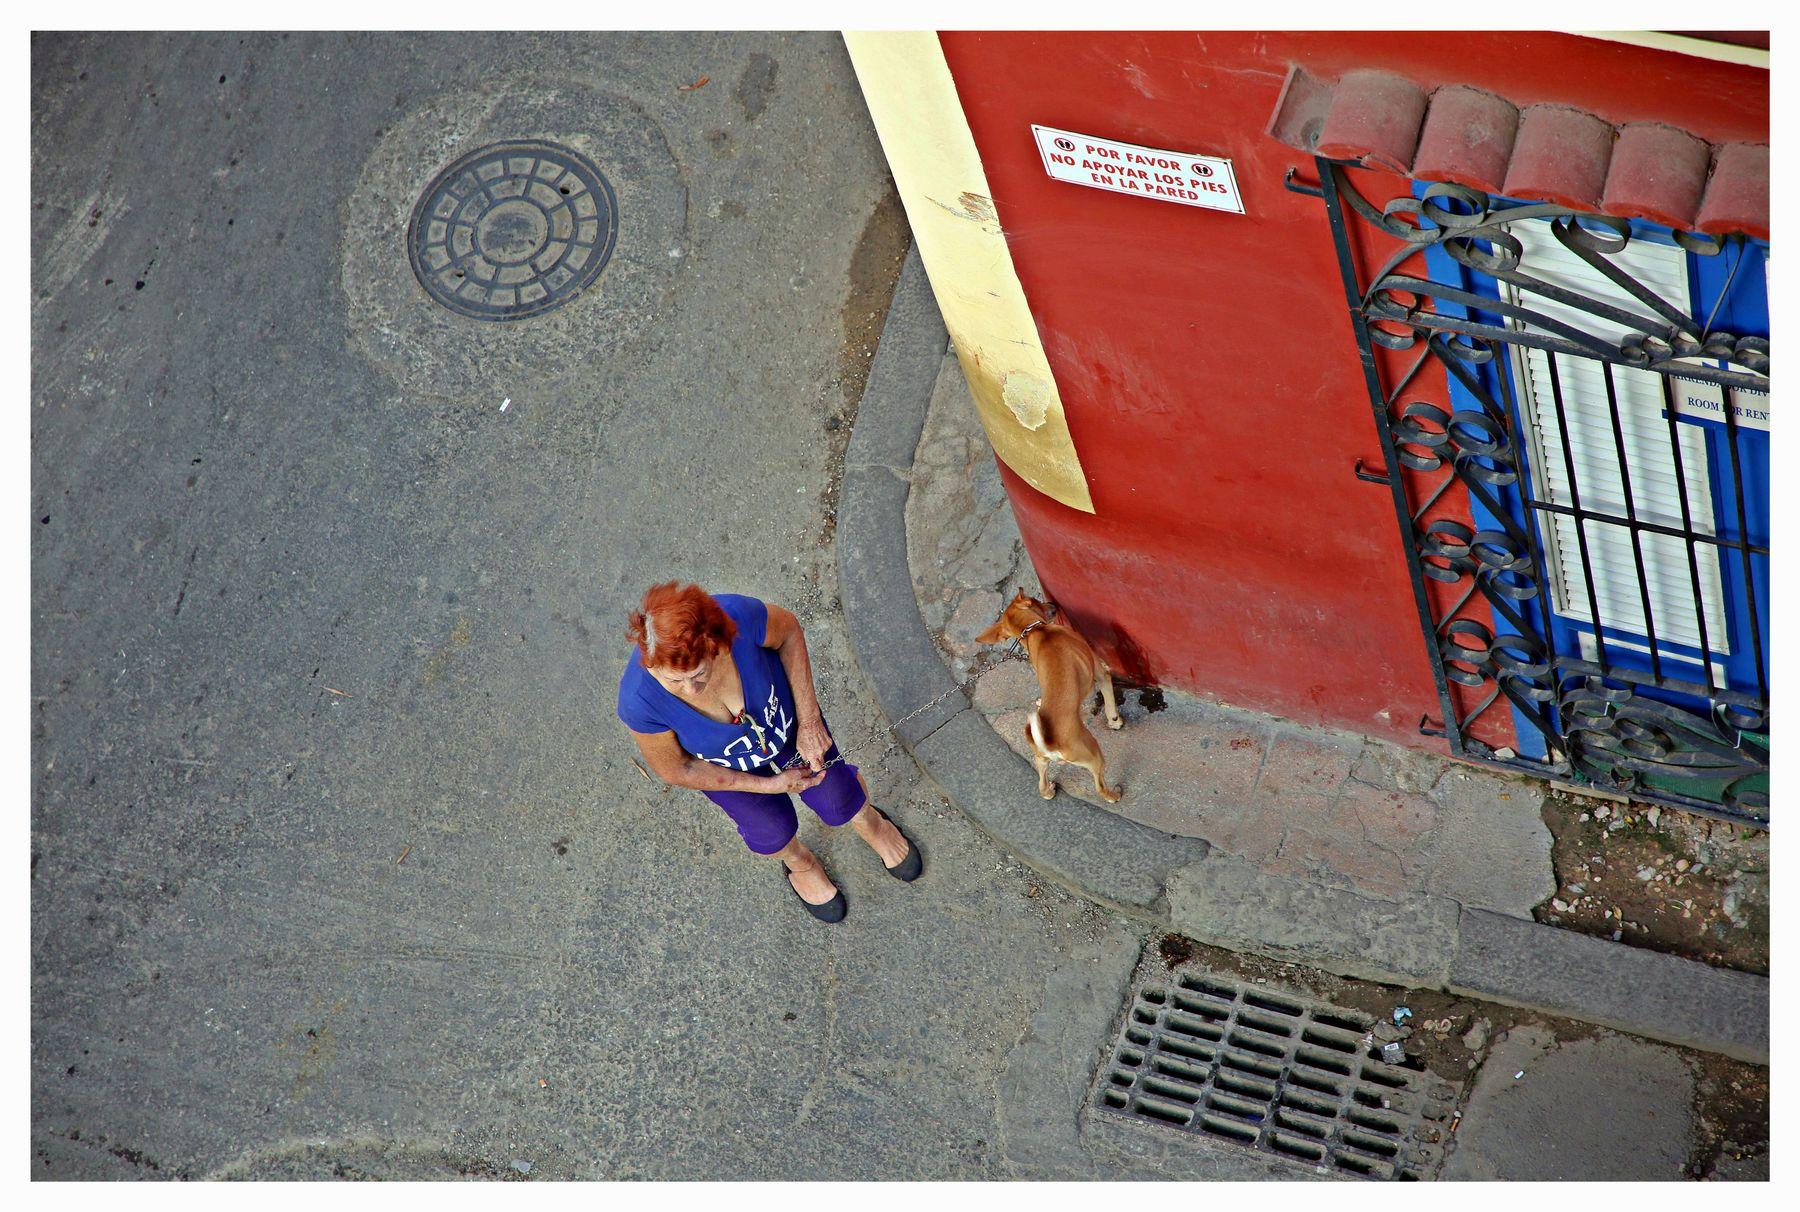 en el balcón aquel cuba la habana vieja libre isla bonita cubanos perro